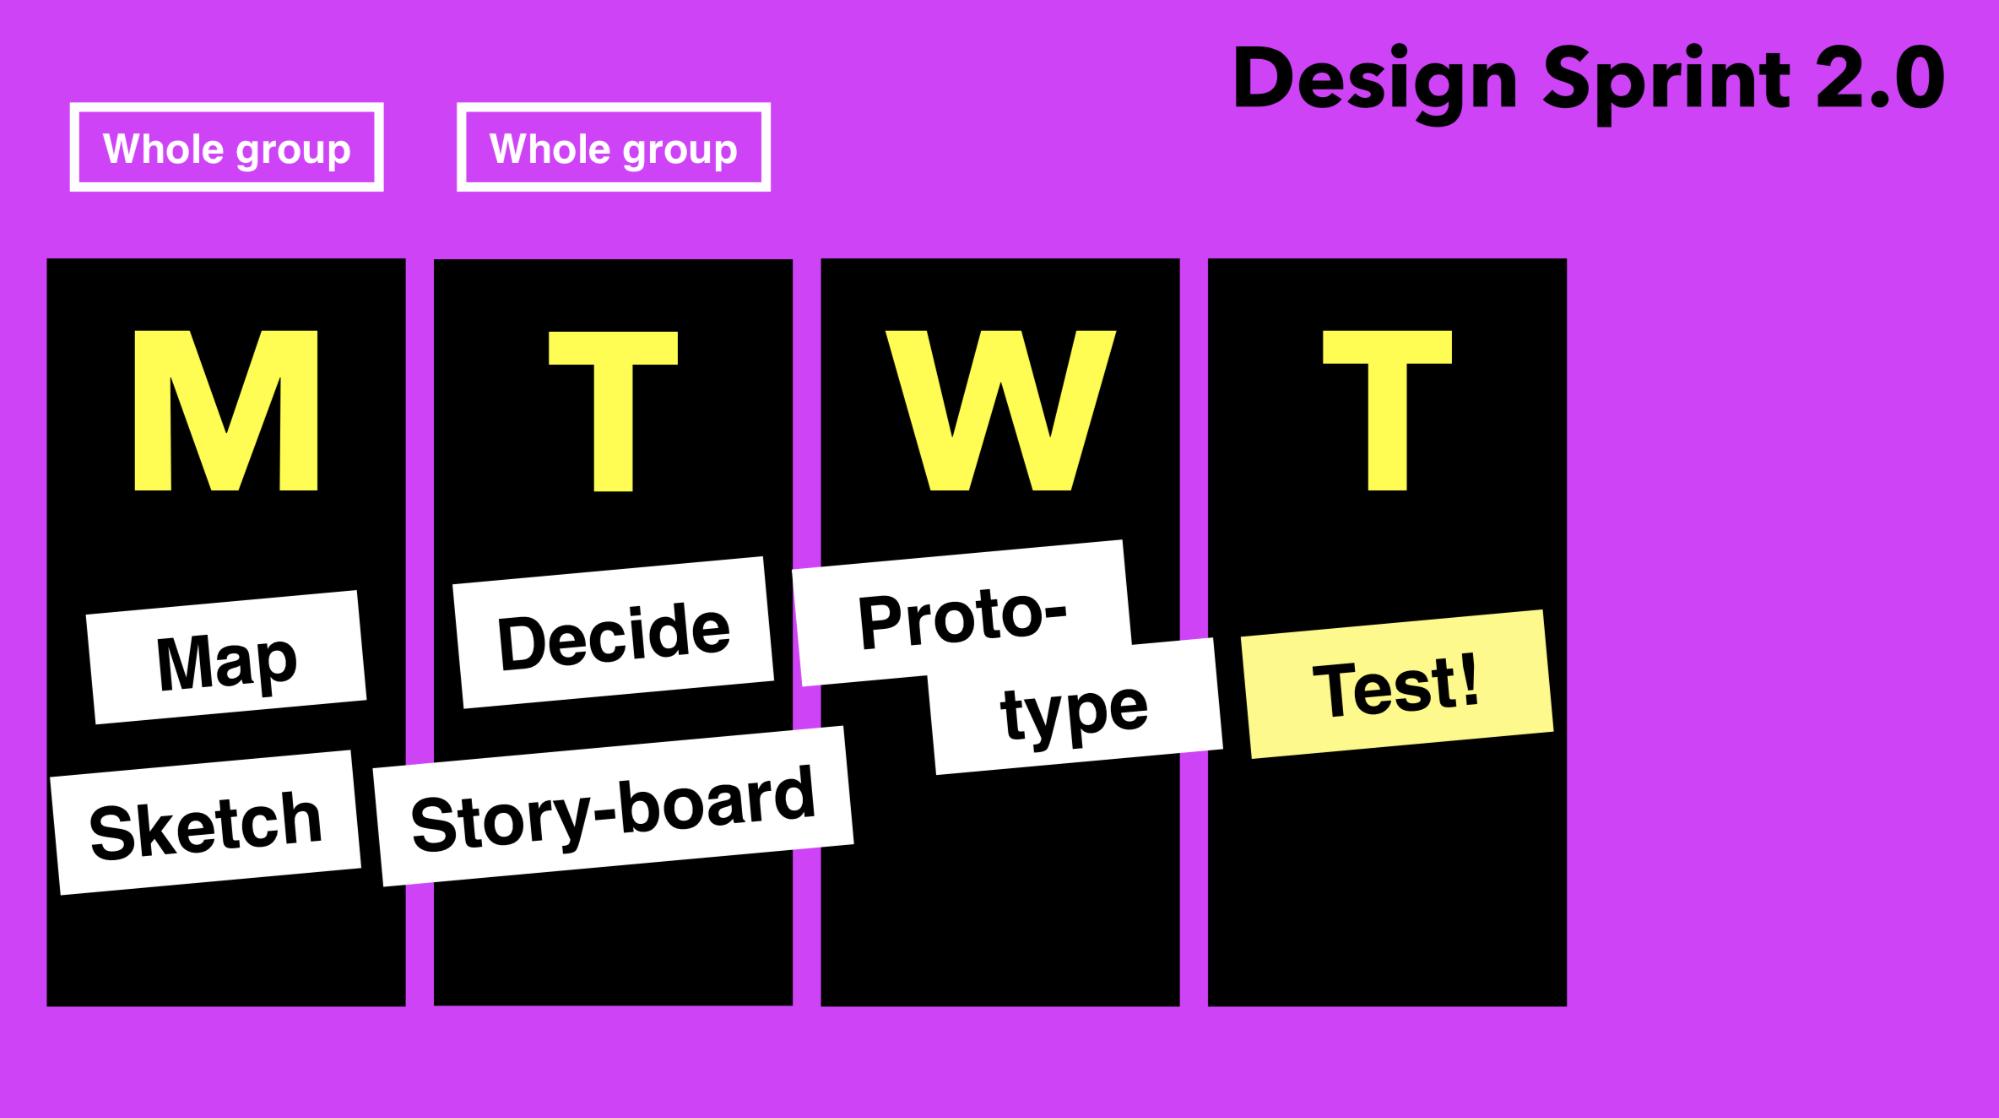 Design Sprint 2.0